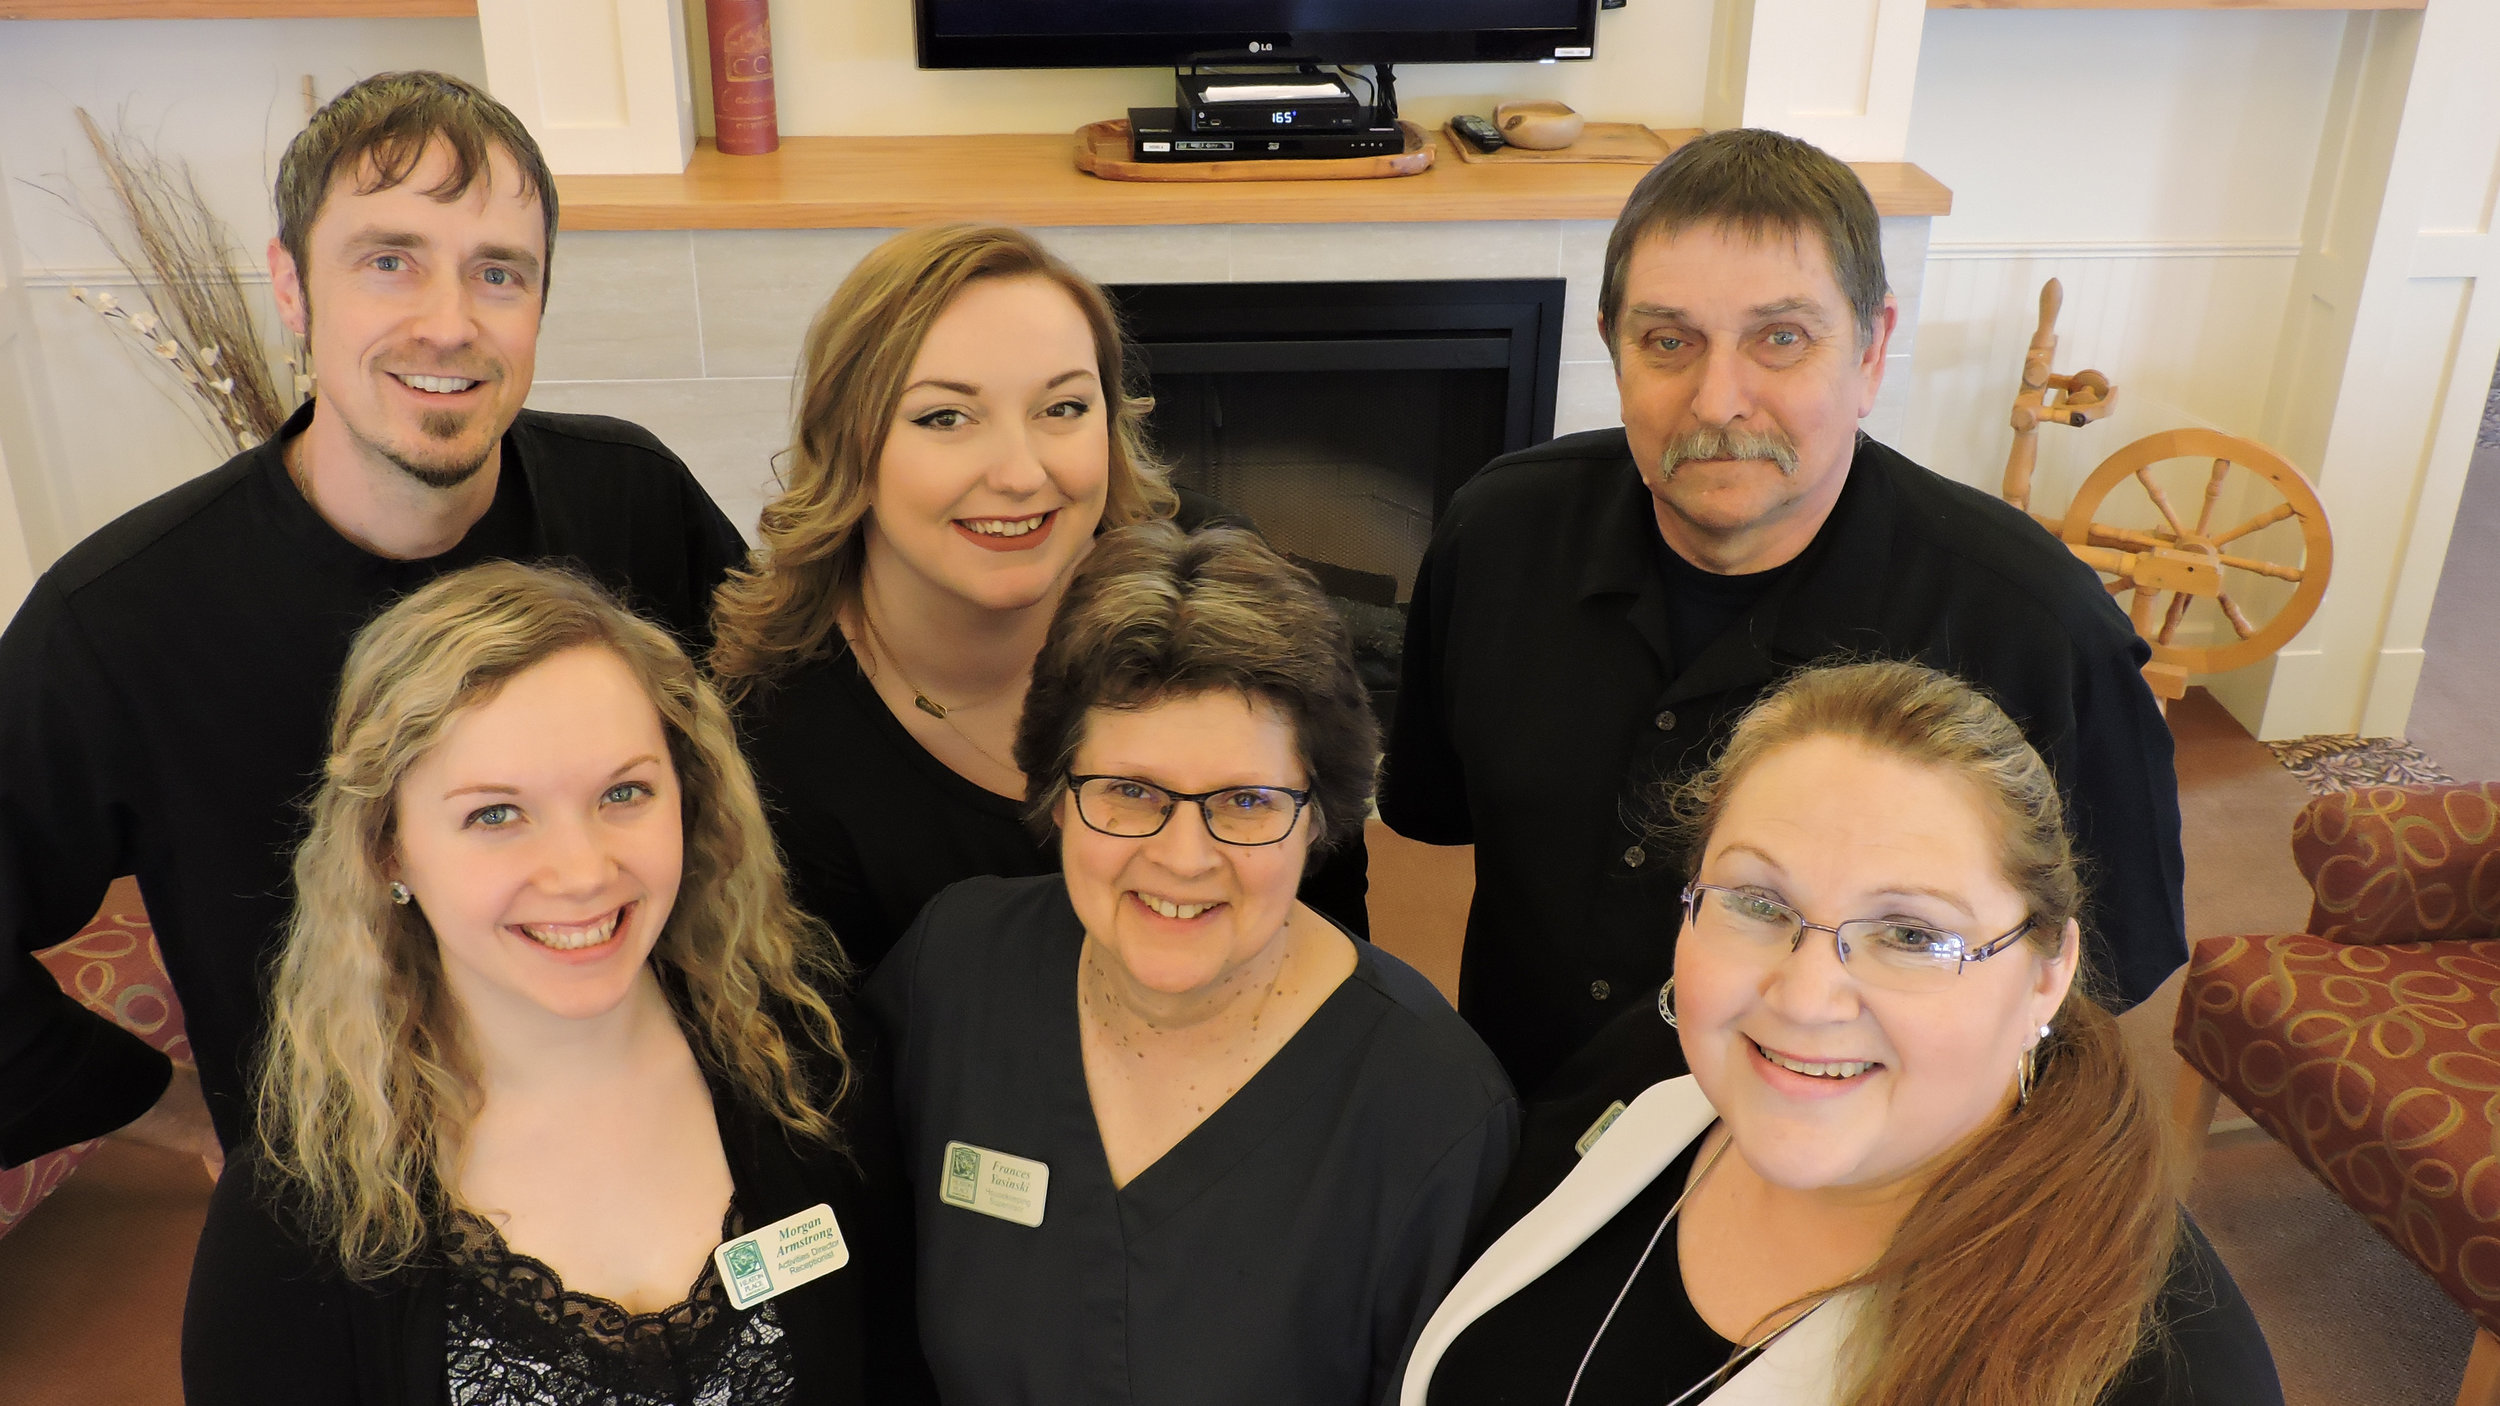 The staff of heaton place retirement community